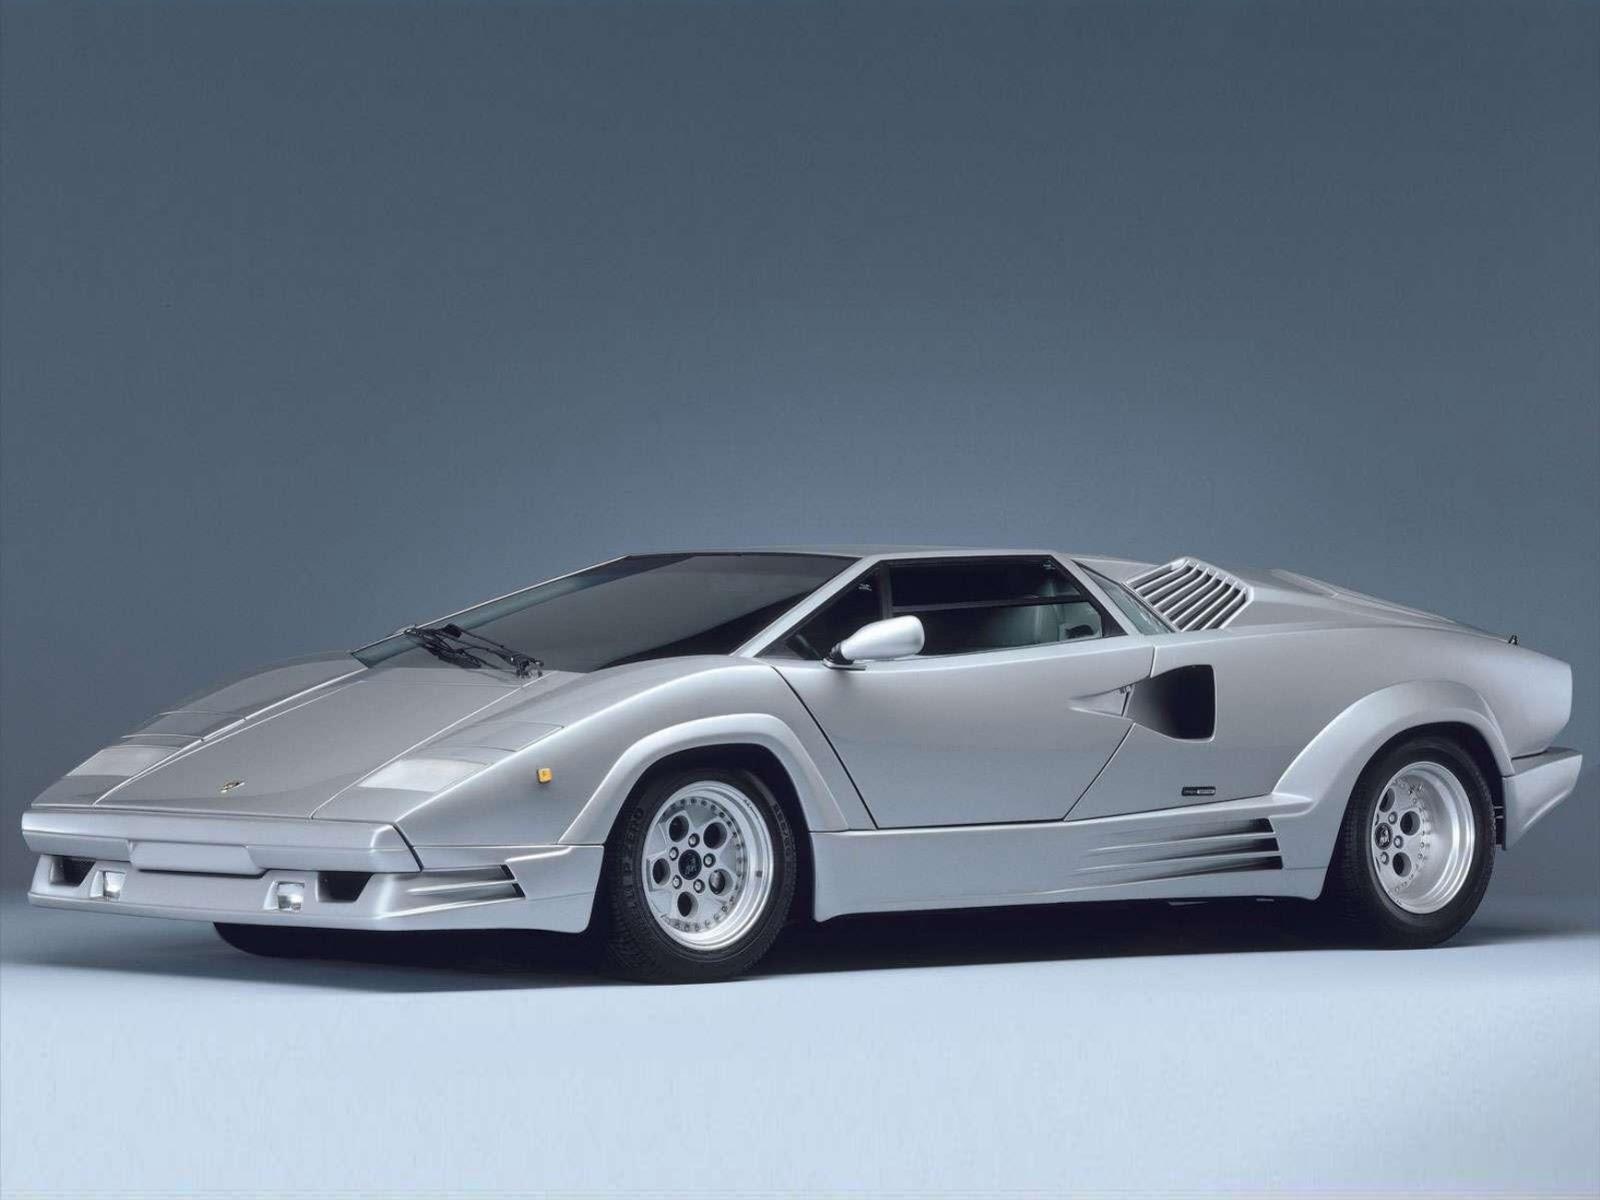 Luxury Lamborghini Cars: Lamborghini Countach Wallpaper